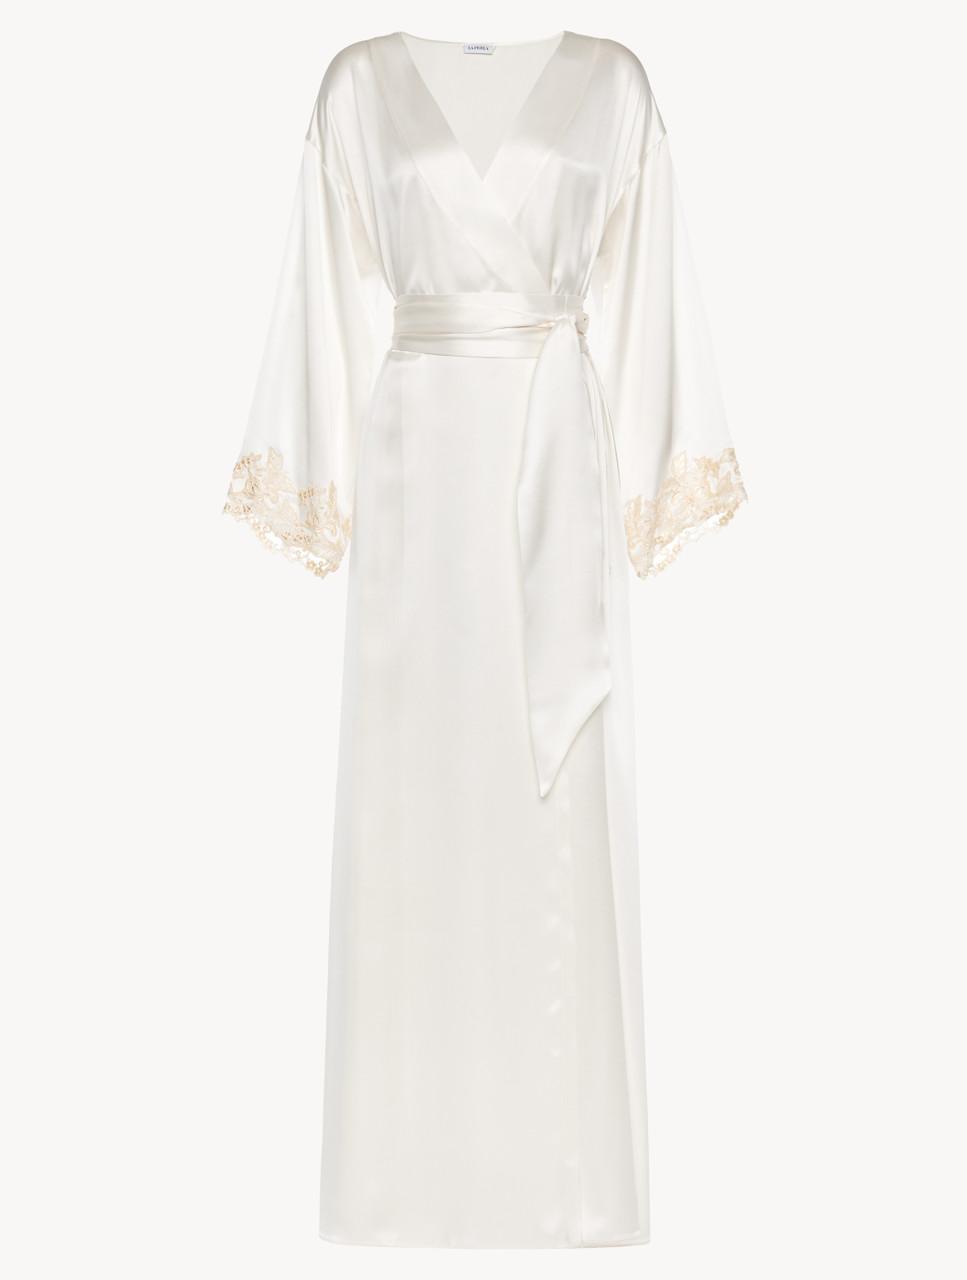 White Long Robe With Frastaglio La Perla Uk